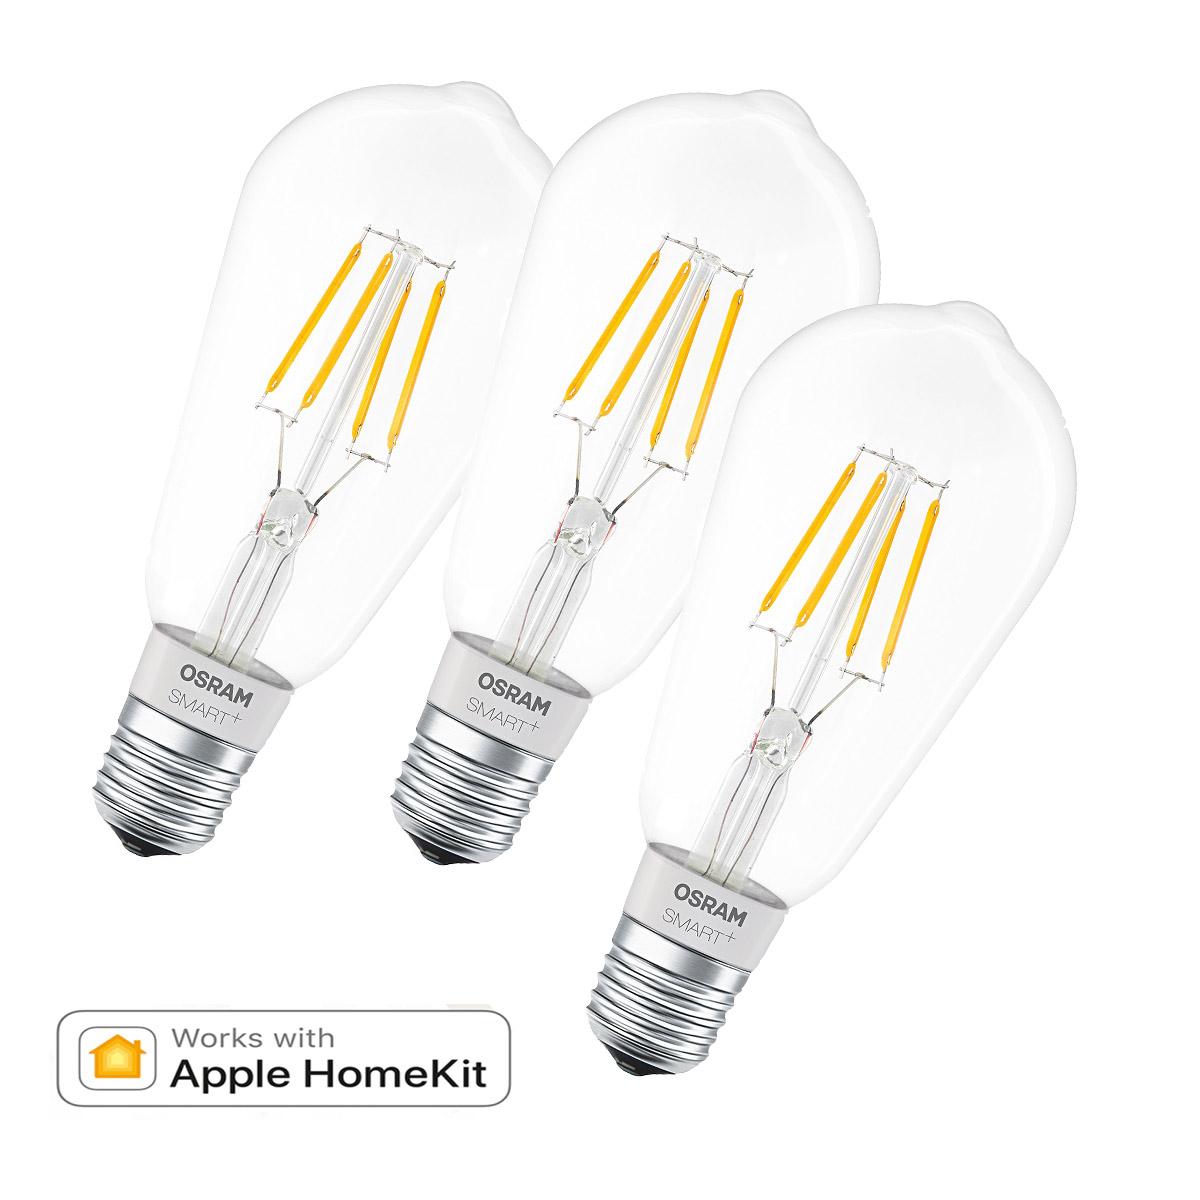 Osram Smart Apple Homekit Edison Filament Lampe E27 5 5w 50w 650lm K Dim 3e